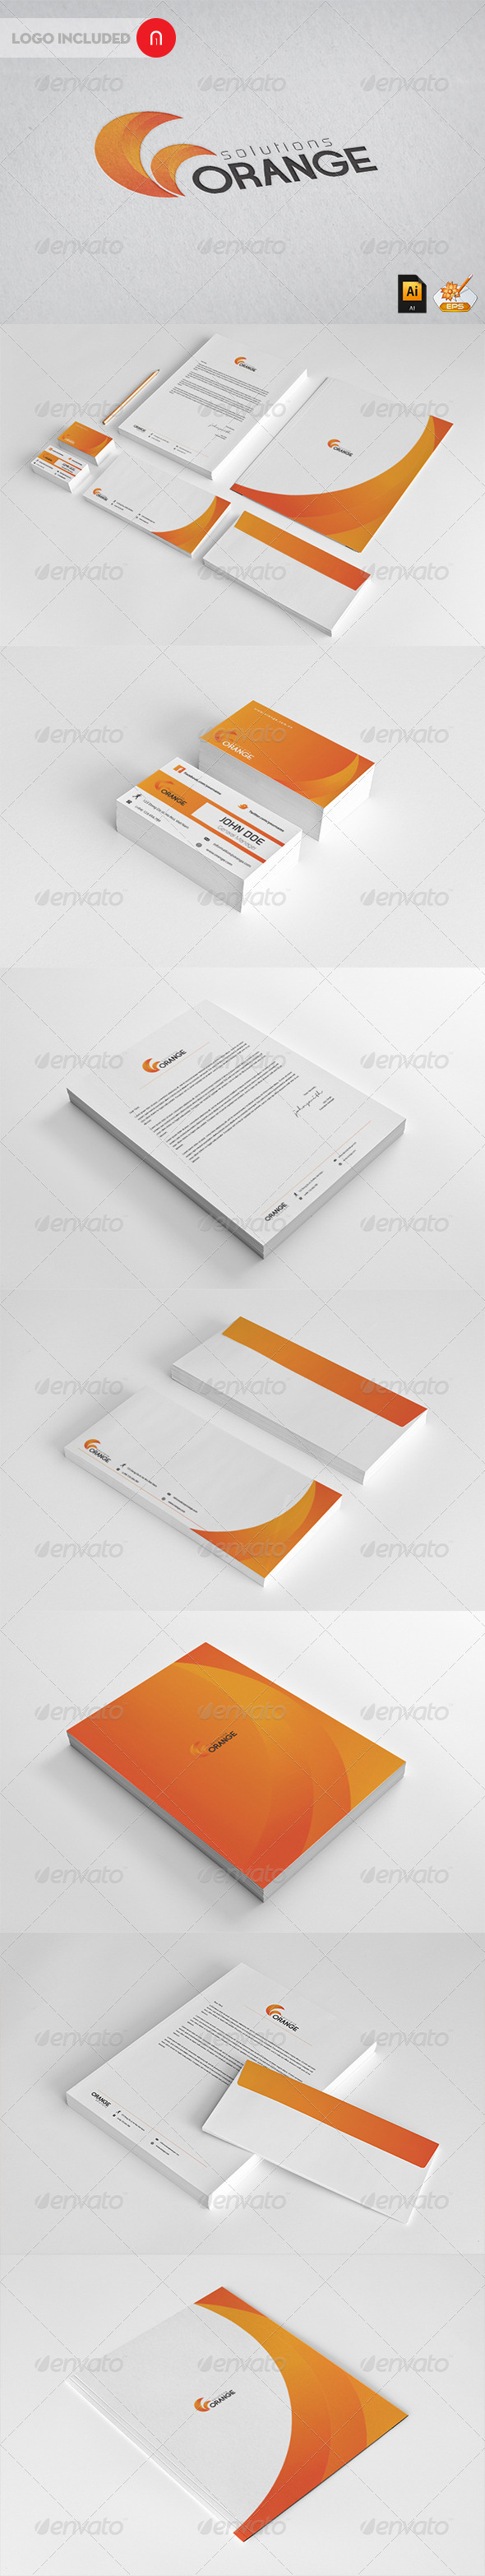 Corporate Startioney  Orange Solutions - Stationery Print Templates